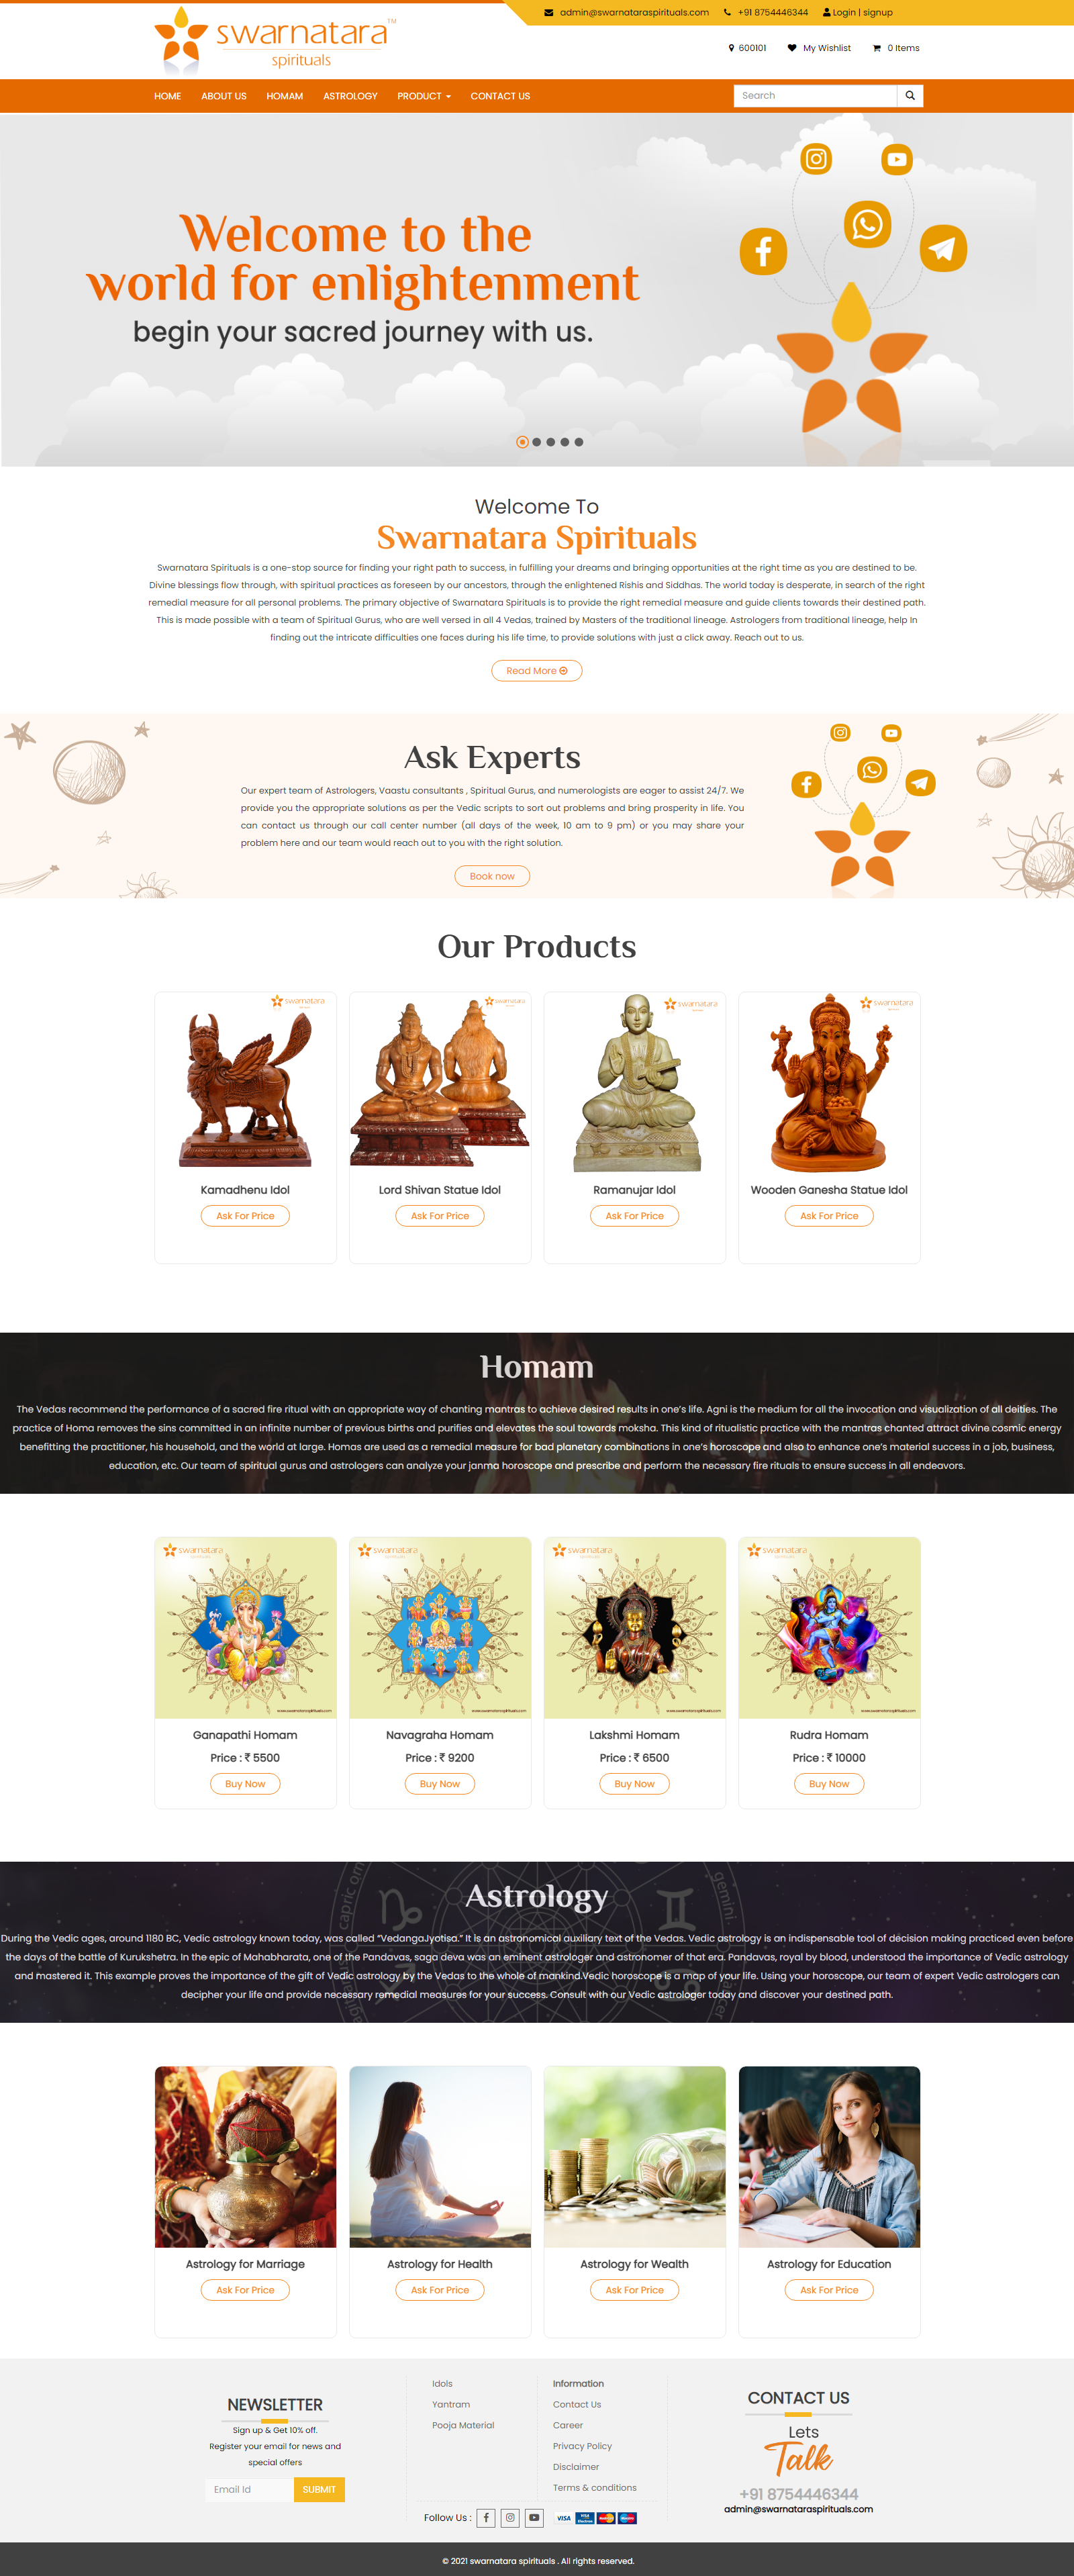 Swarnatara Spirituals